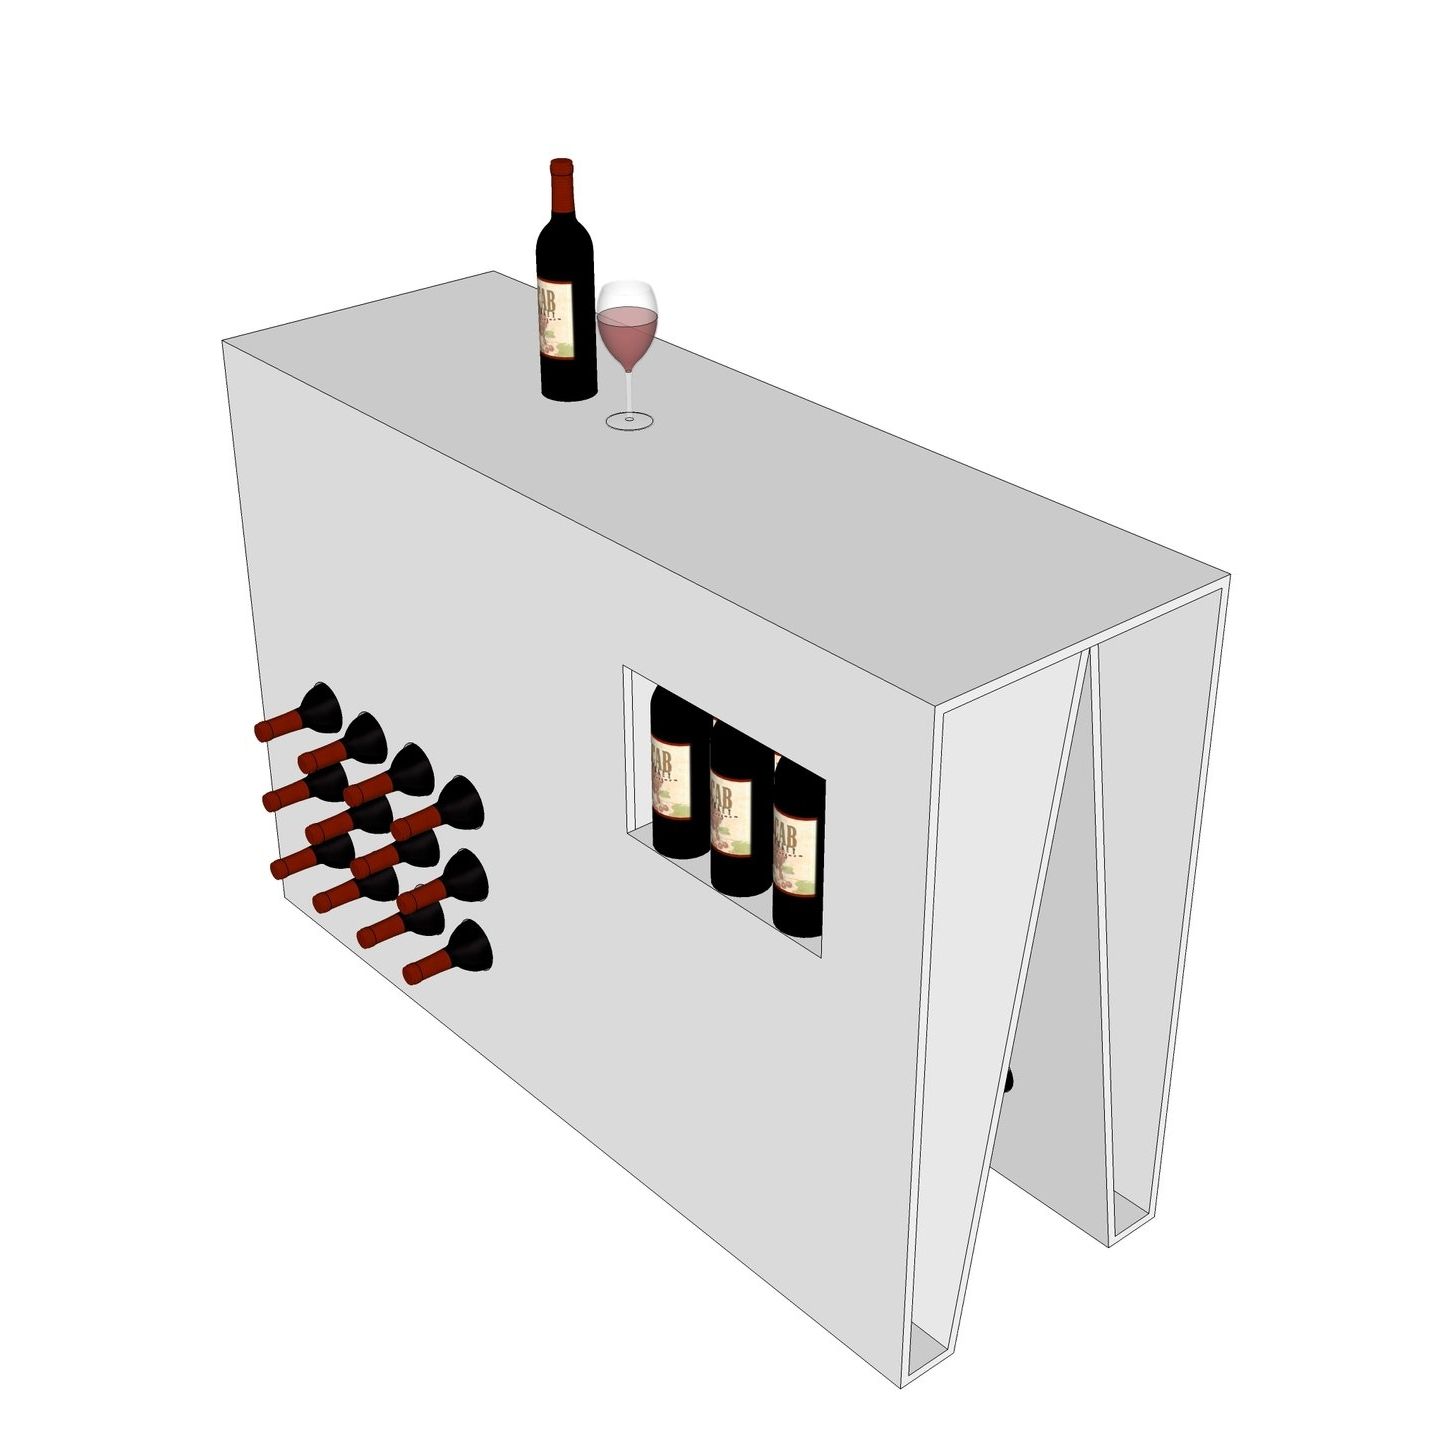 ECDA_Small Wine Stand img03 11-16.jpg